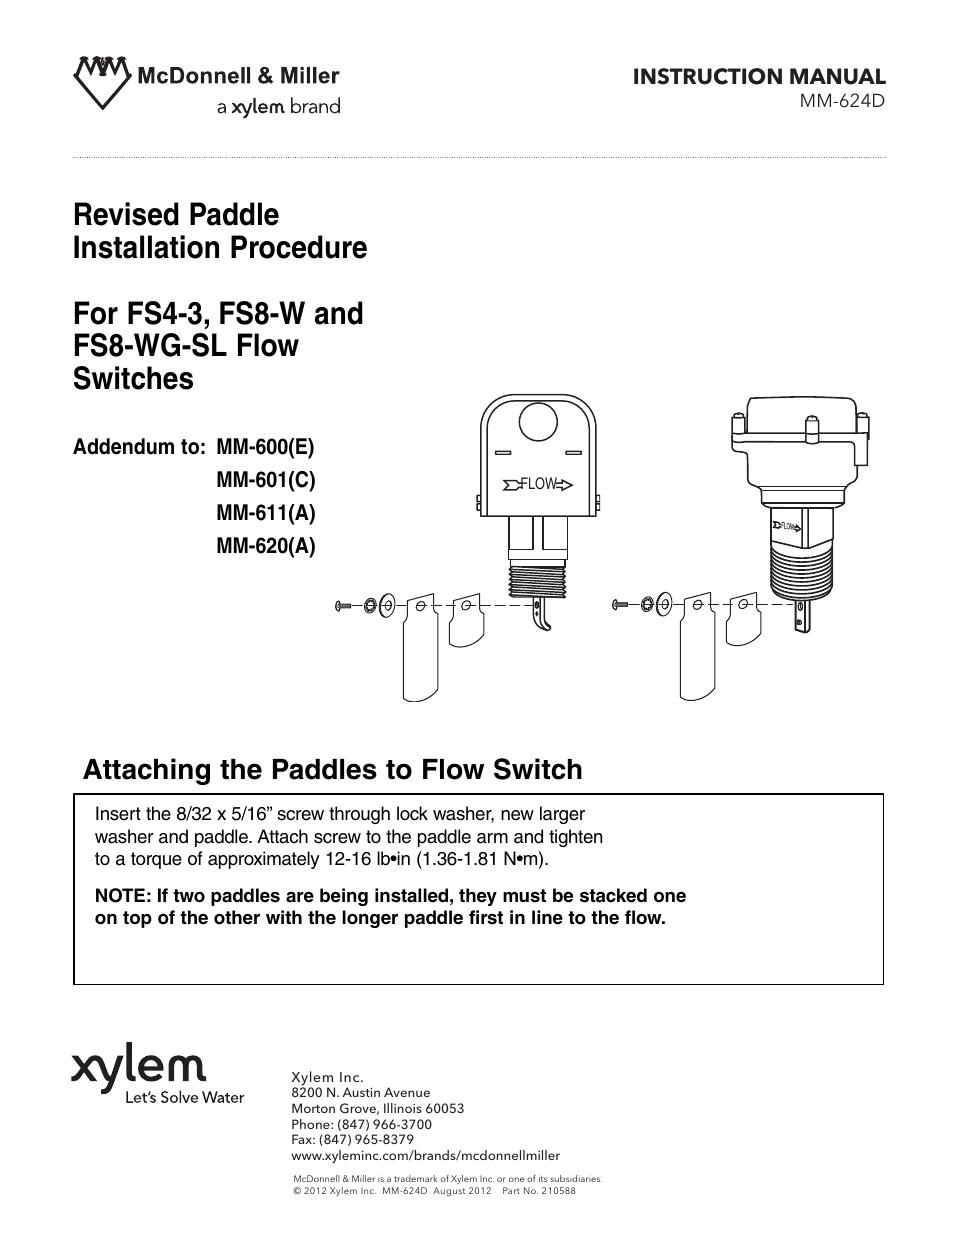 Xylem Mm 624d Paddle Installation Procedure For Fs4 3 Fs8 W  U0026 Fs8 Wg Sl Flow Switches User